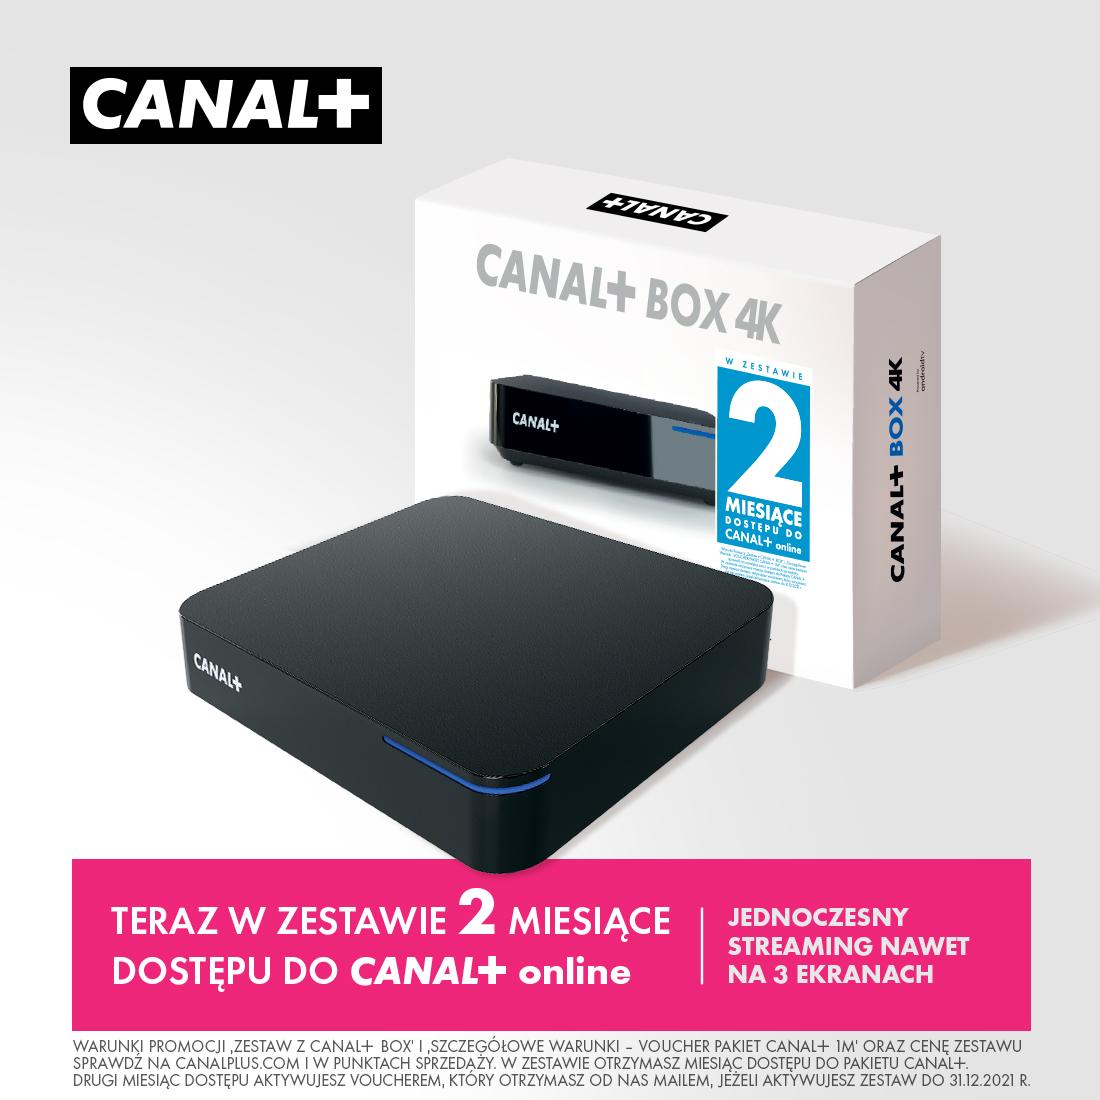 Usługa CANAL+ BOX 4K Ultra HD